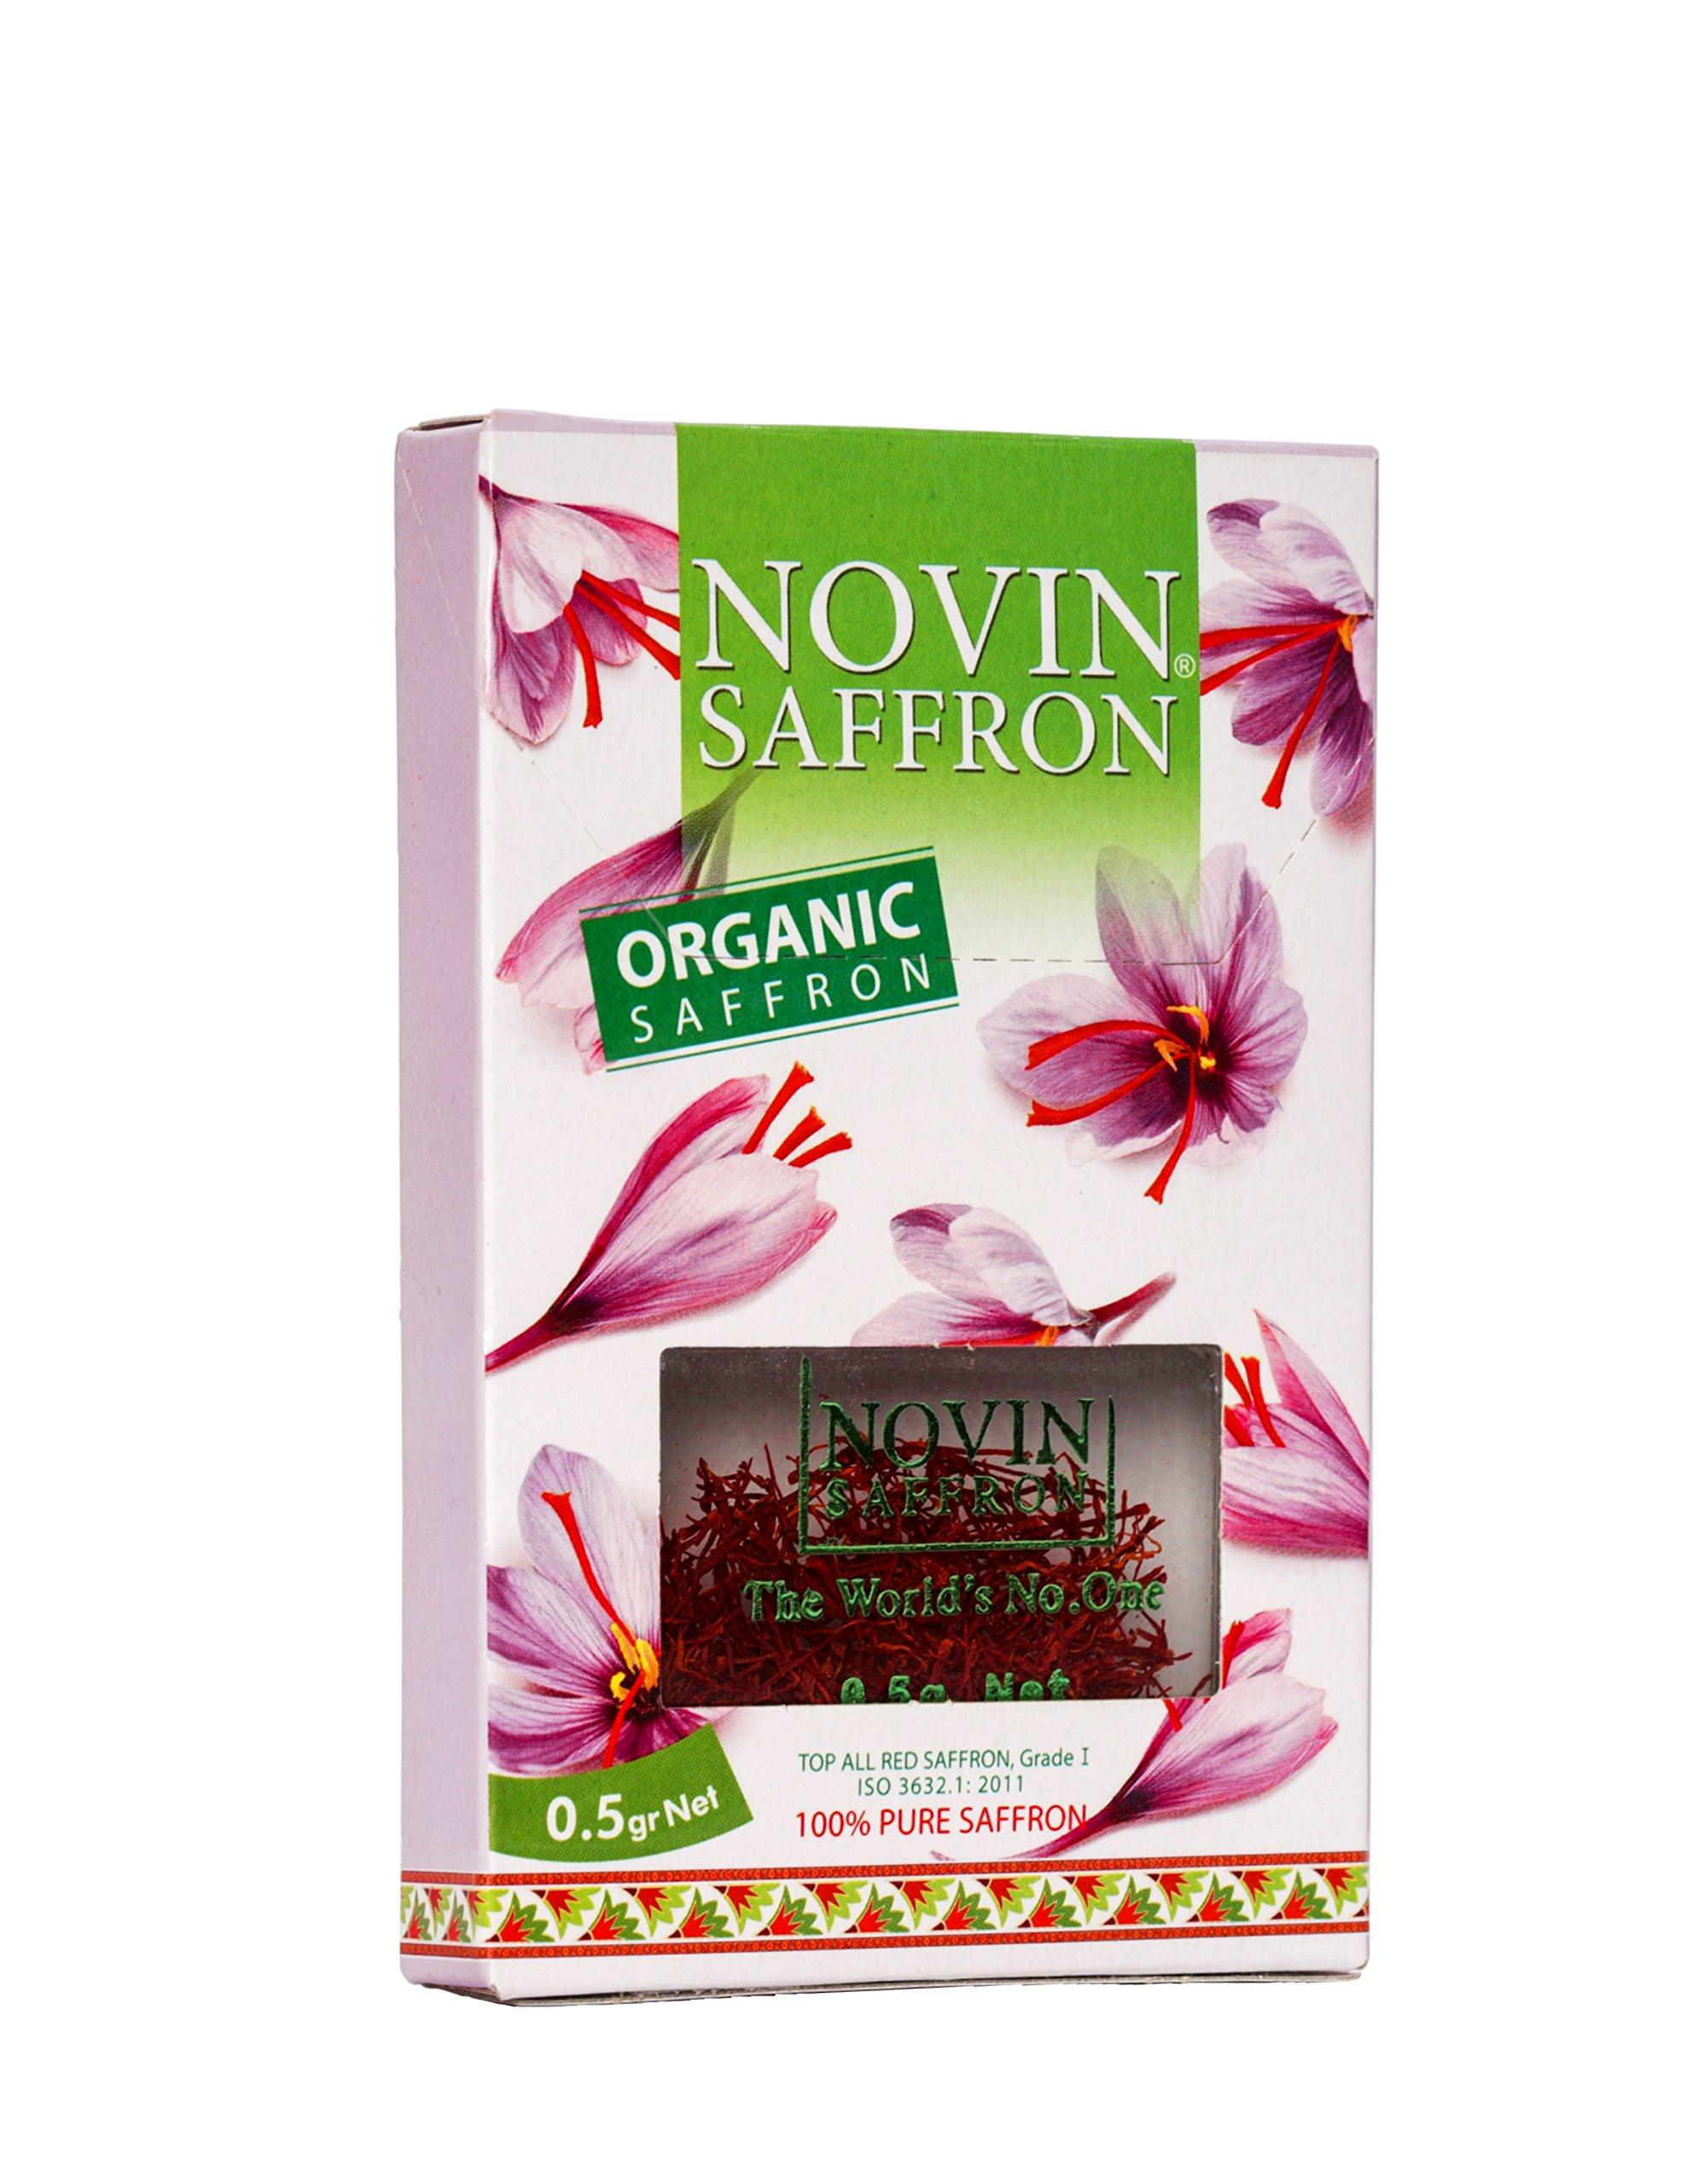 Organic Saffron 0.5 gr Premium Quality Persian Saffron,AA1